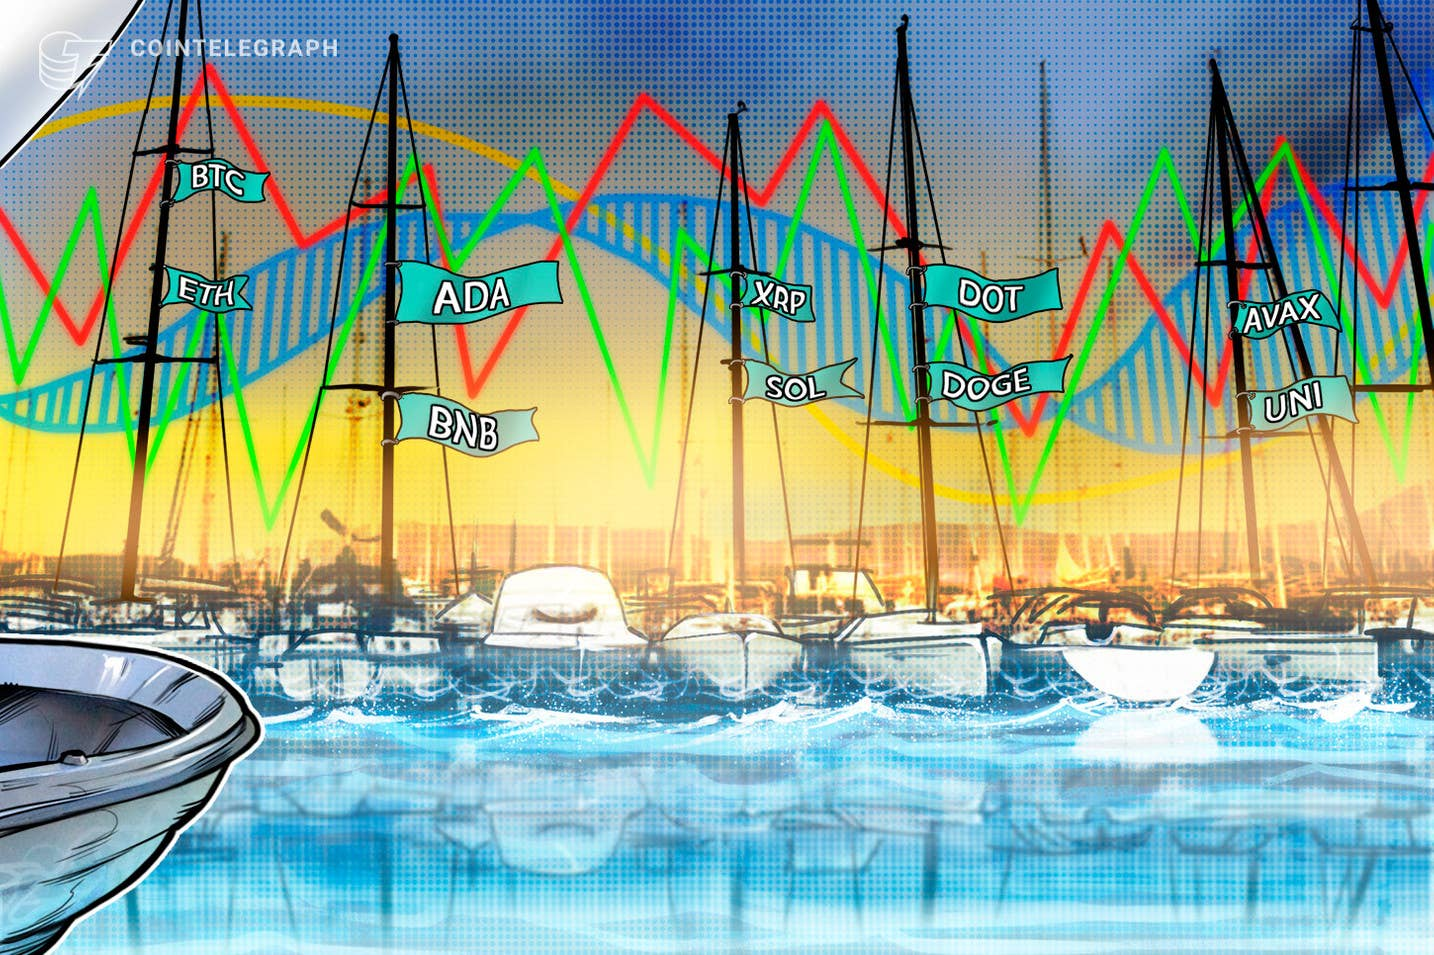 Análise de preço 9/22: BTC, ETH, ADA, BNB, XRP, SOL, DOT, DOGE, AVAX, UNI